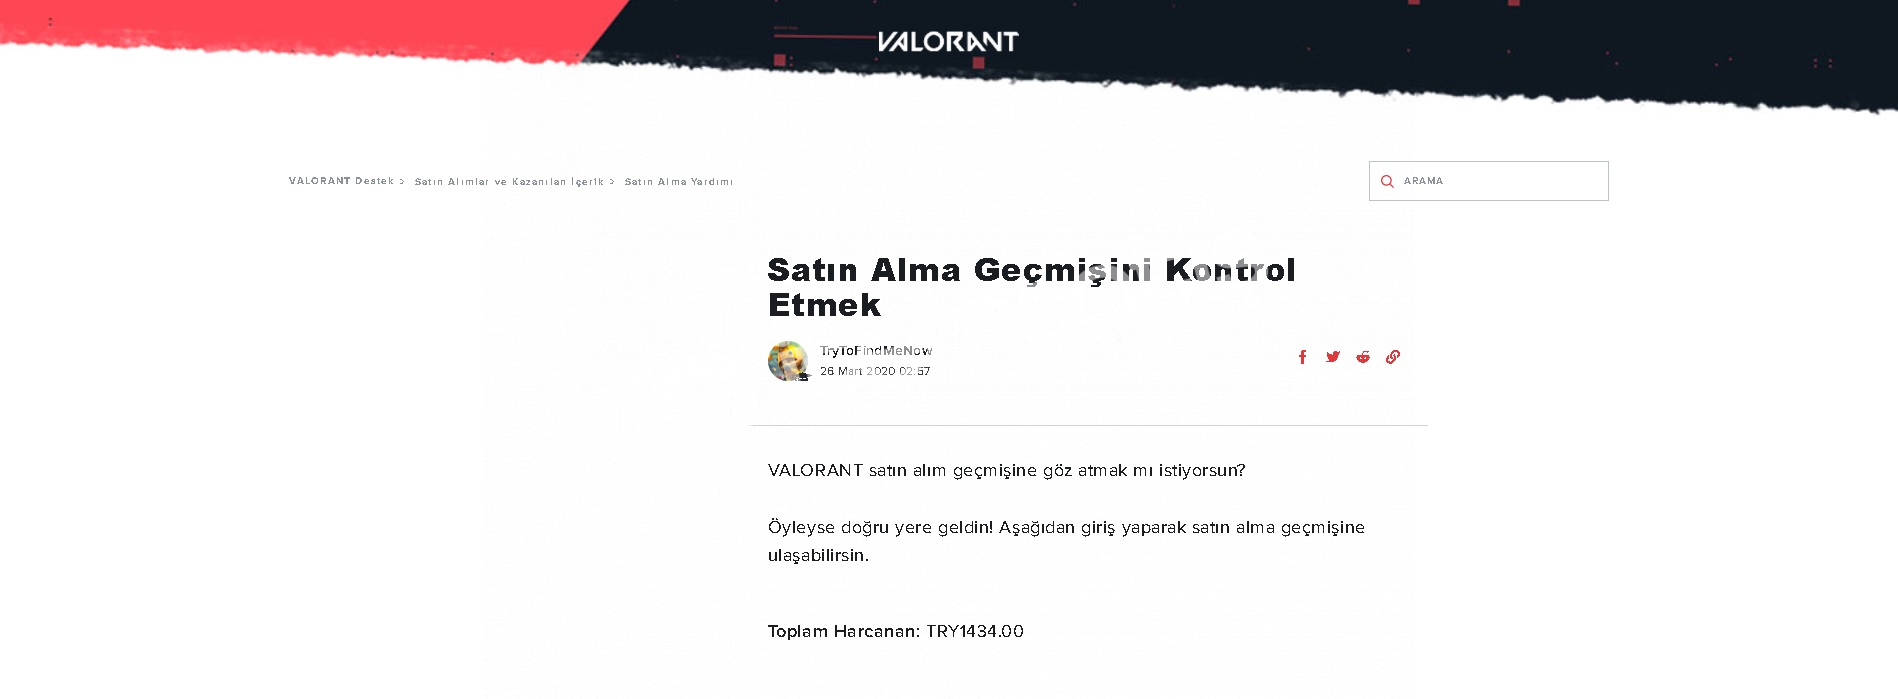 EJDER VANDAL + YAĞMACI VANDAL+ ASİL VANDAL + DELİPOP VANDAL